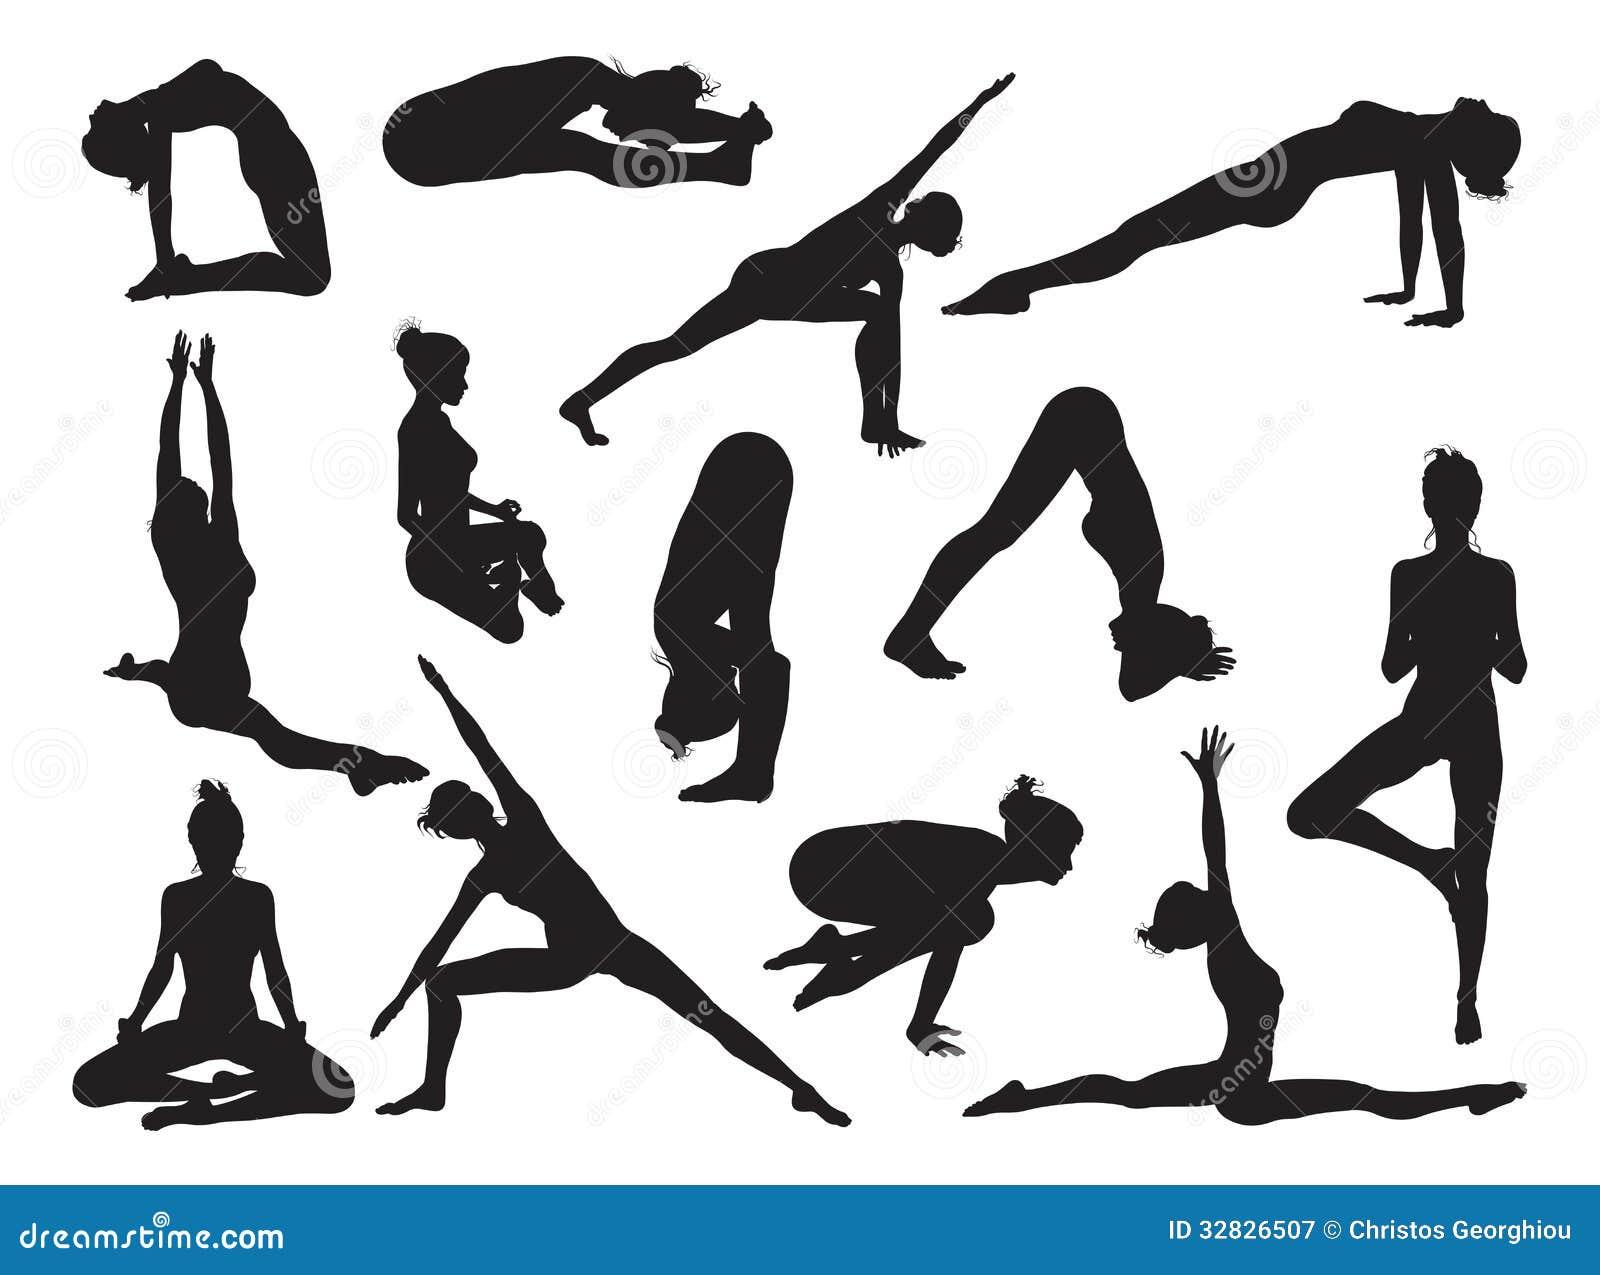 Yoga Poses And Names For Kids Yoga Pose Women Silhou...